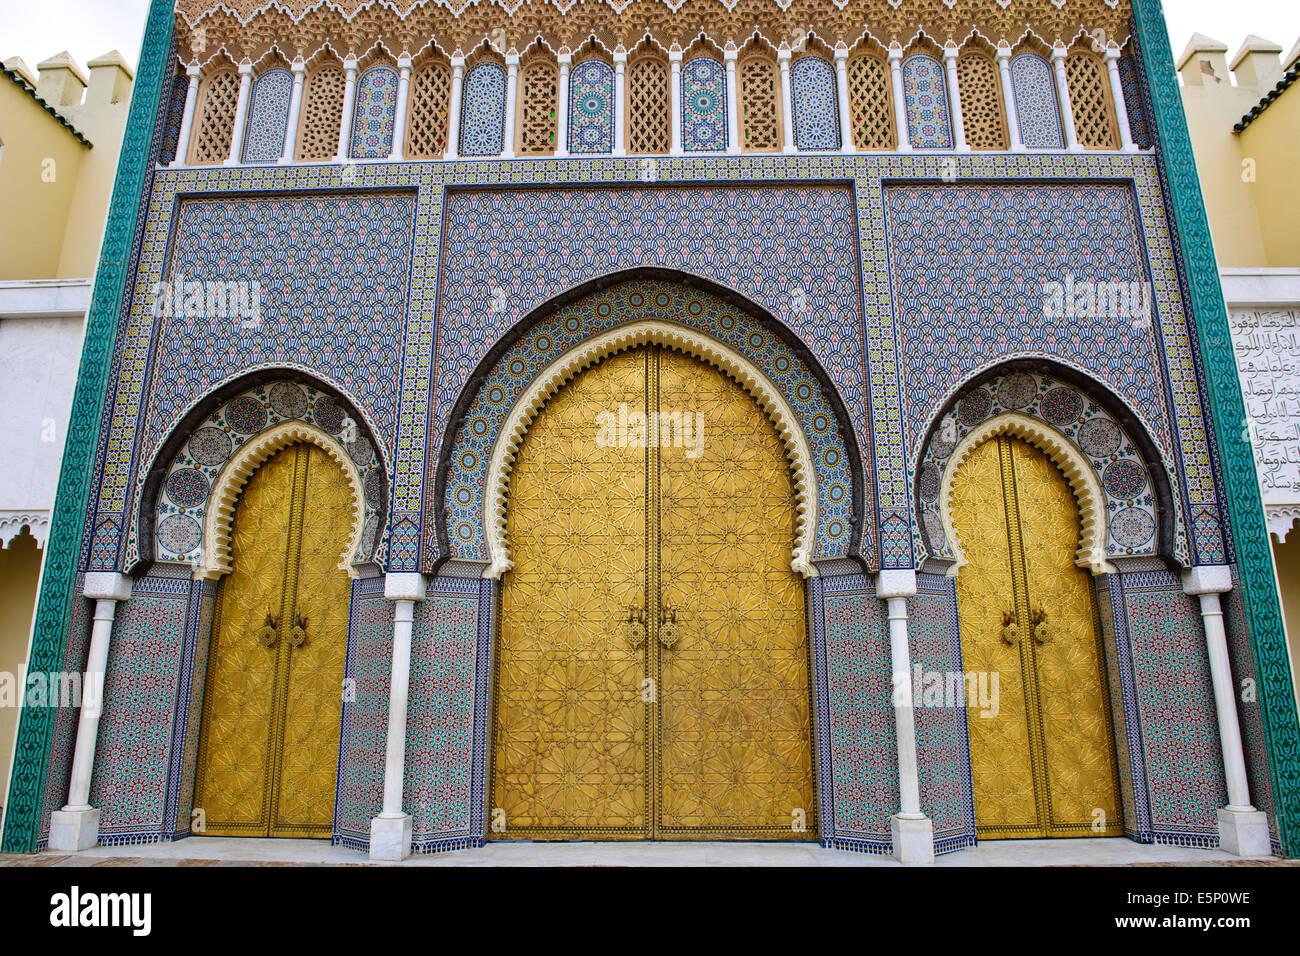 Golden Moorish GatesRichly ornamentedEngraved Bronze DoorsLalla Mina GardensSquareDar el-MakhzenRoyal PalaceFezMorocco & Golden Moorish GatesRichly ornamentedEngraved Bronze DoorsLalla ...